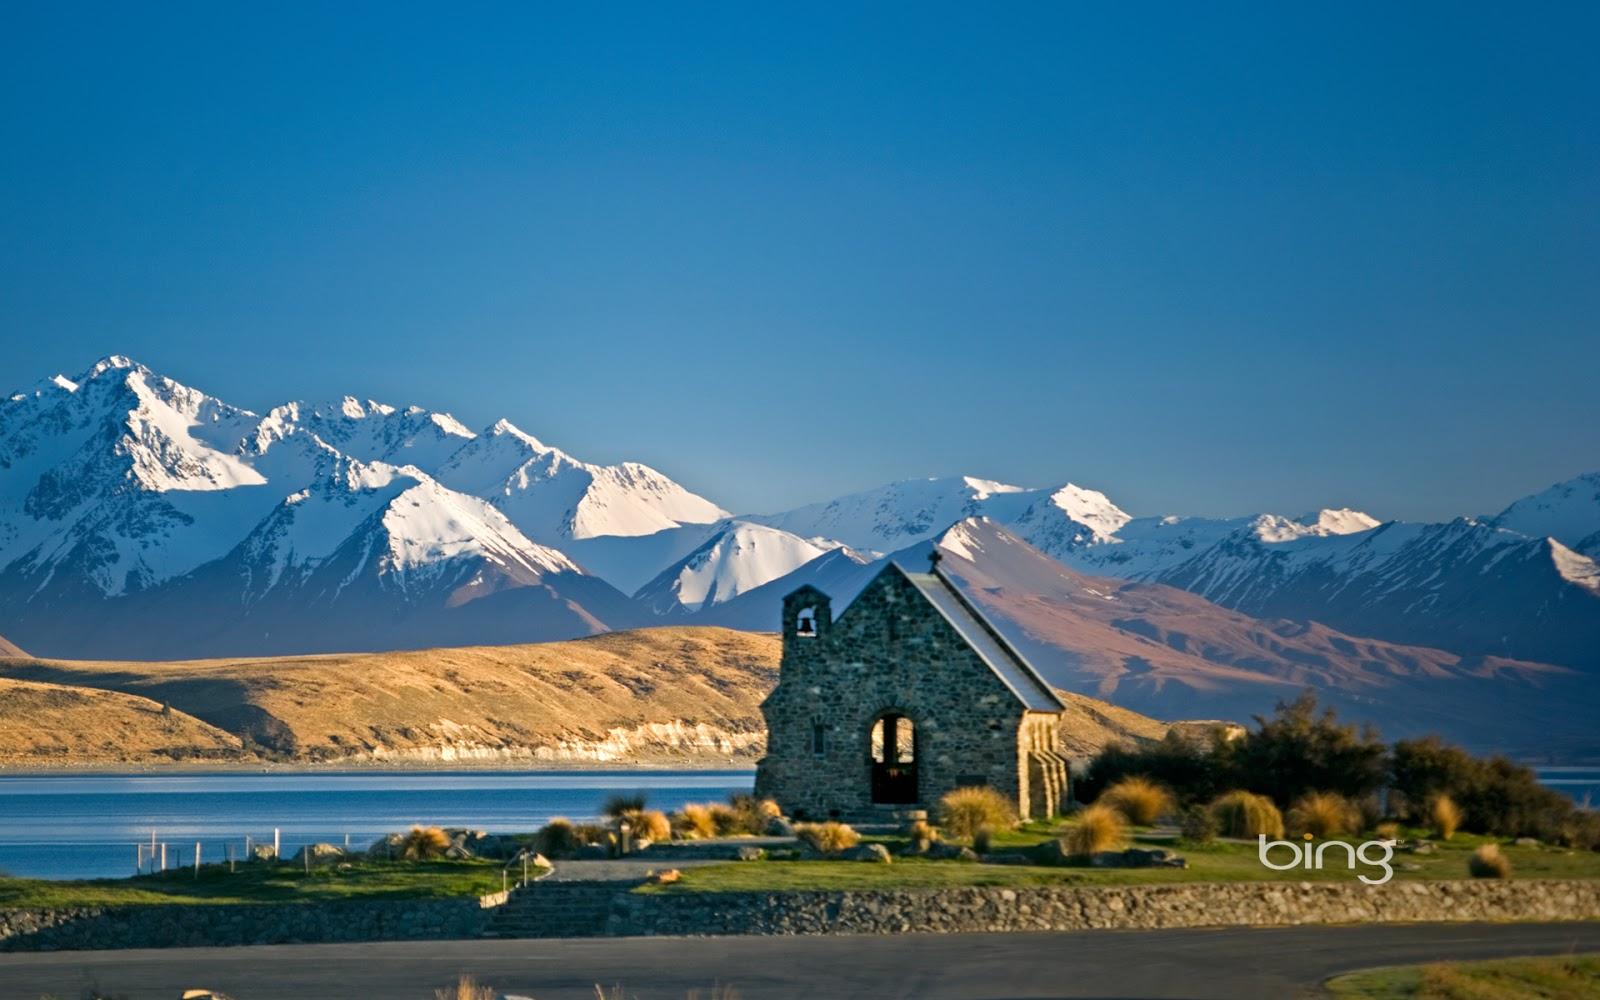 Multonomah Falls Wallpaper Desktop Travel Trip Journey Lake Tekapo New Zealand